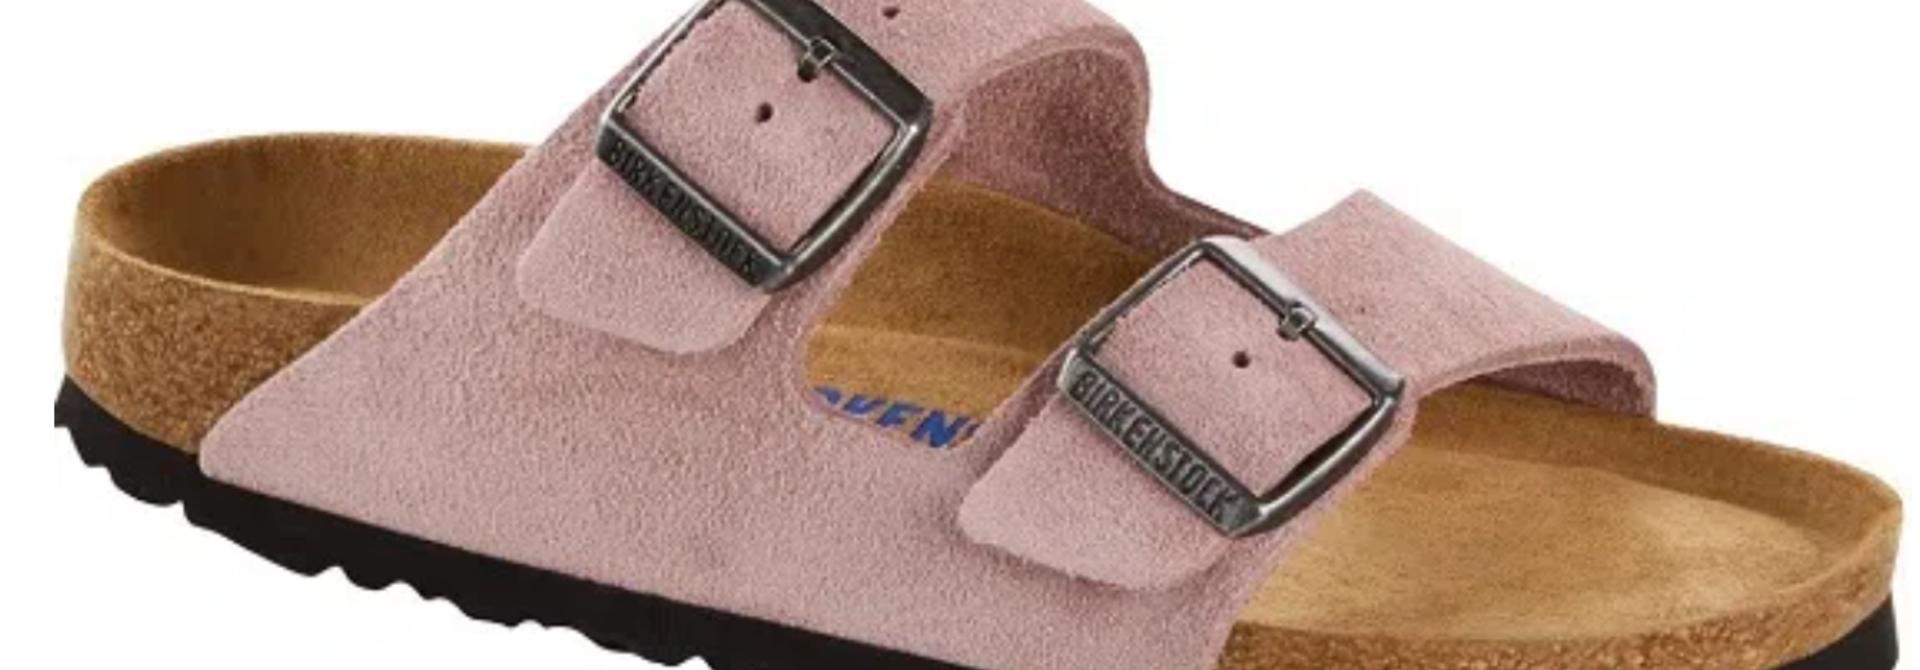 Arizona Soft Footbed Lavender Blush